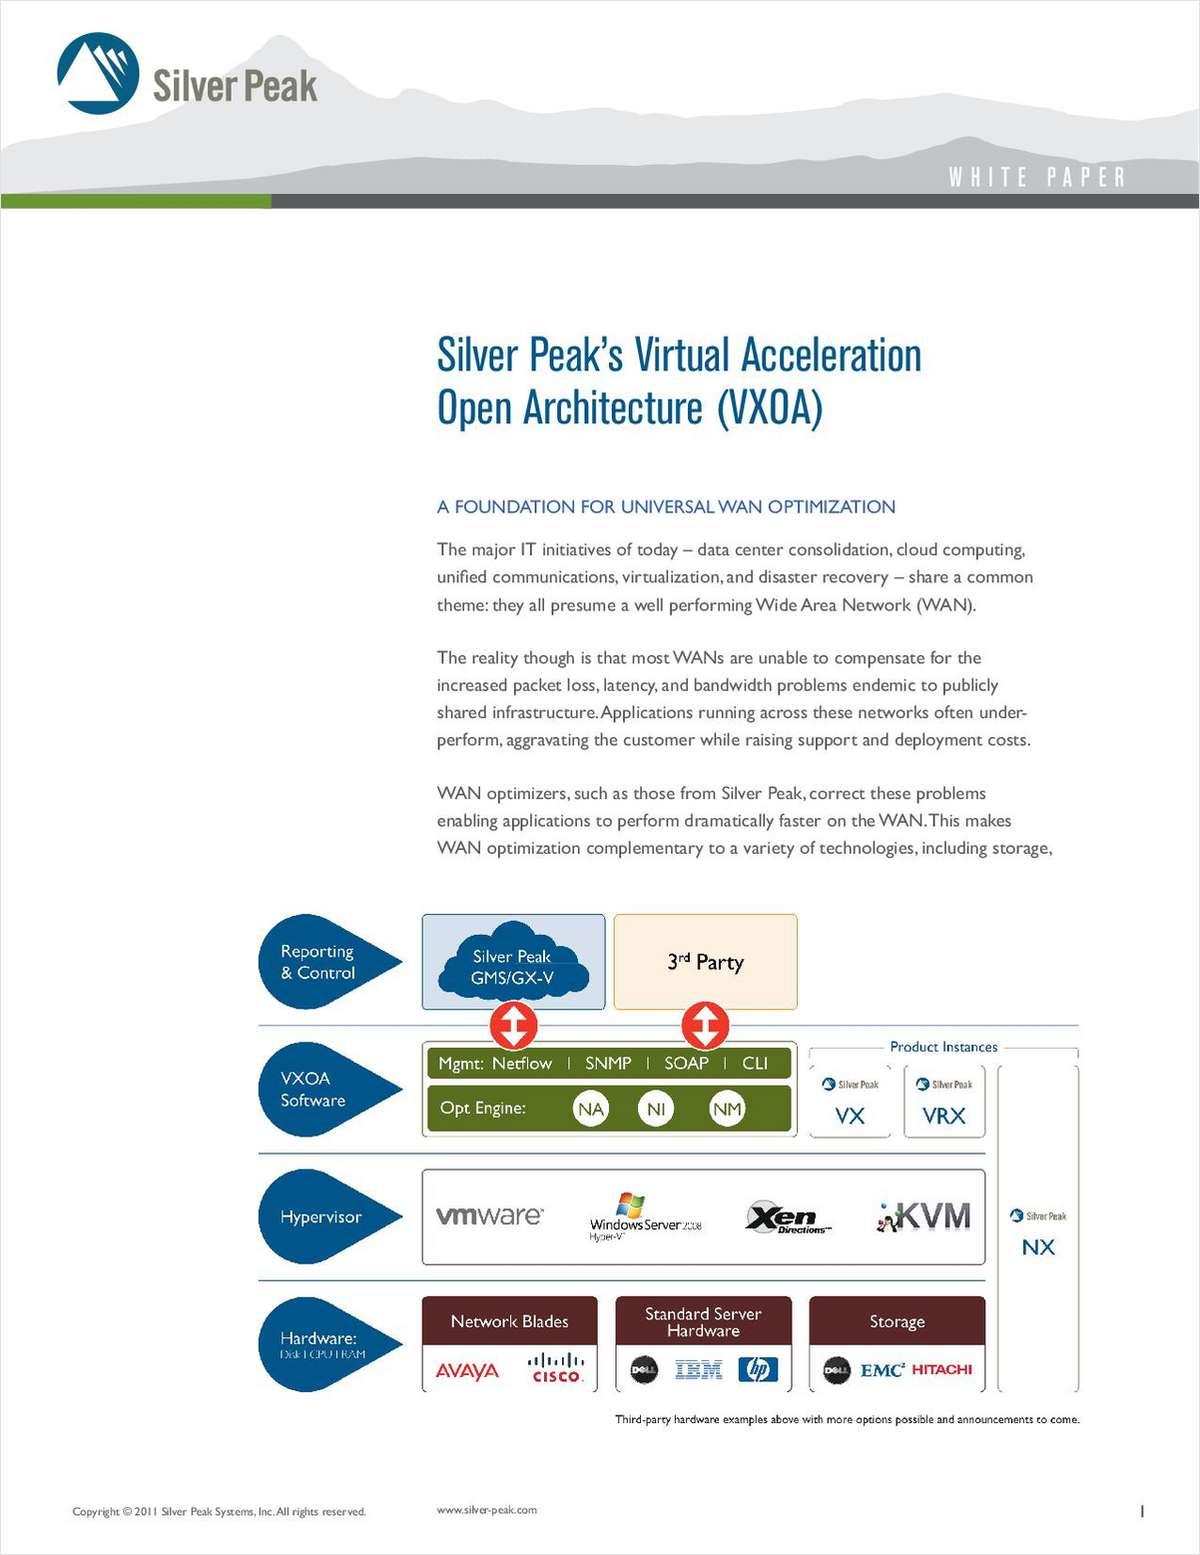 Silver Peak's VXOA: A Foundation for Universal WAN Optimization